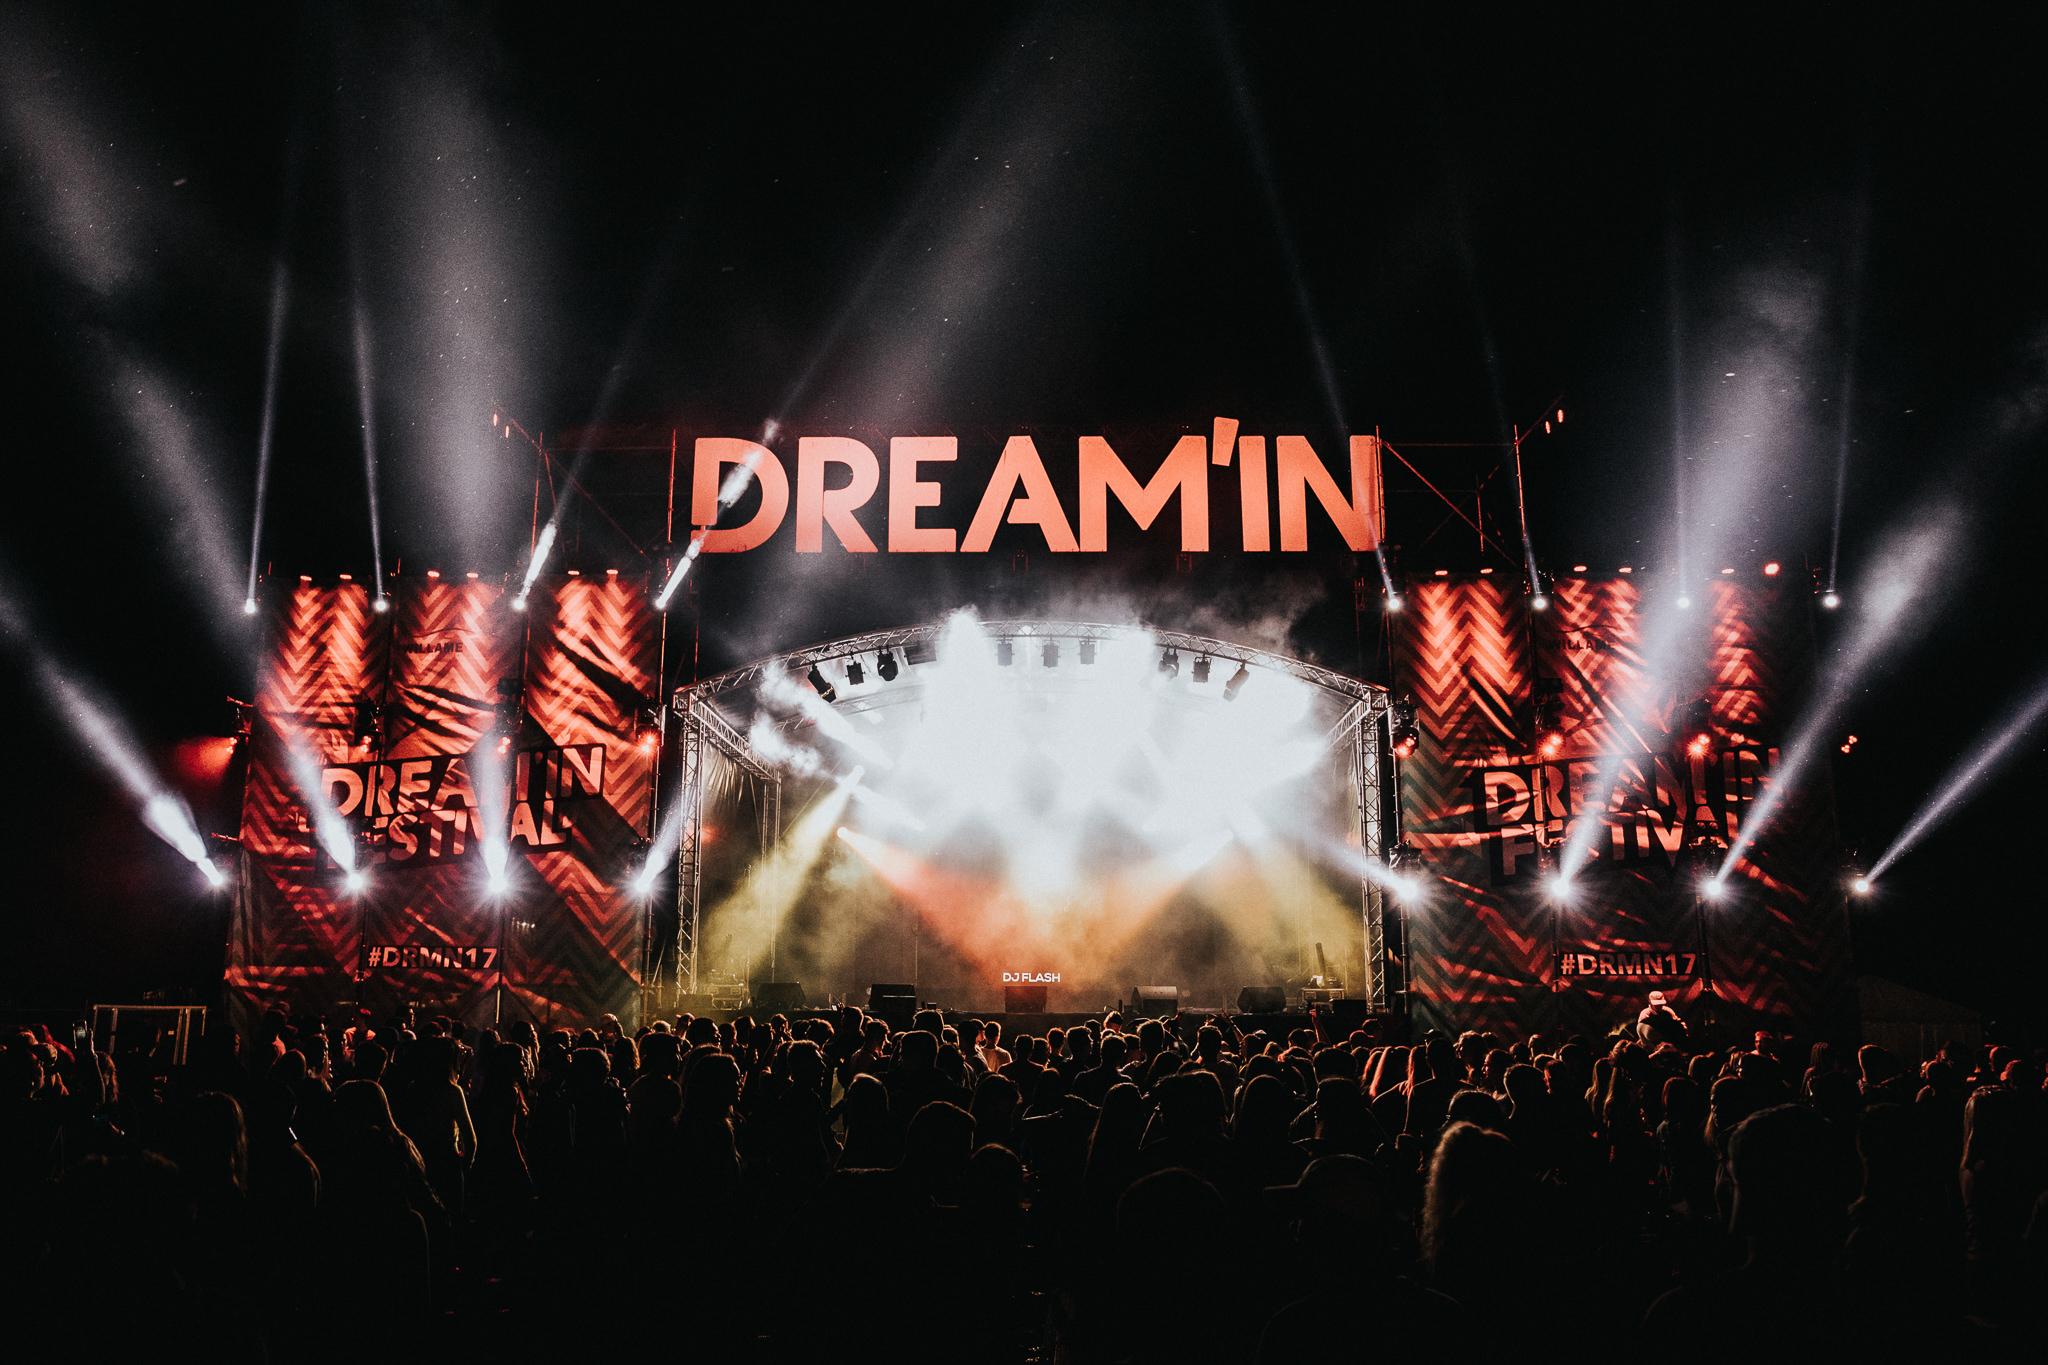 2017-06-23-DJ-FLASH-DREAMIN-TOM-BARBIER-6526-LD.jpg